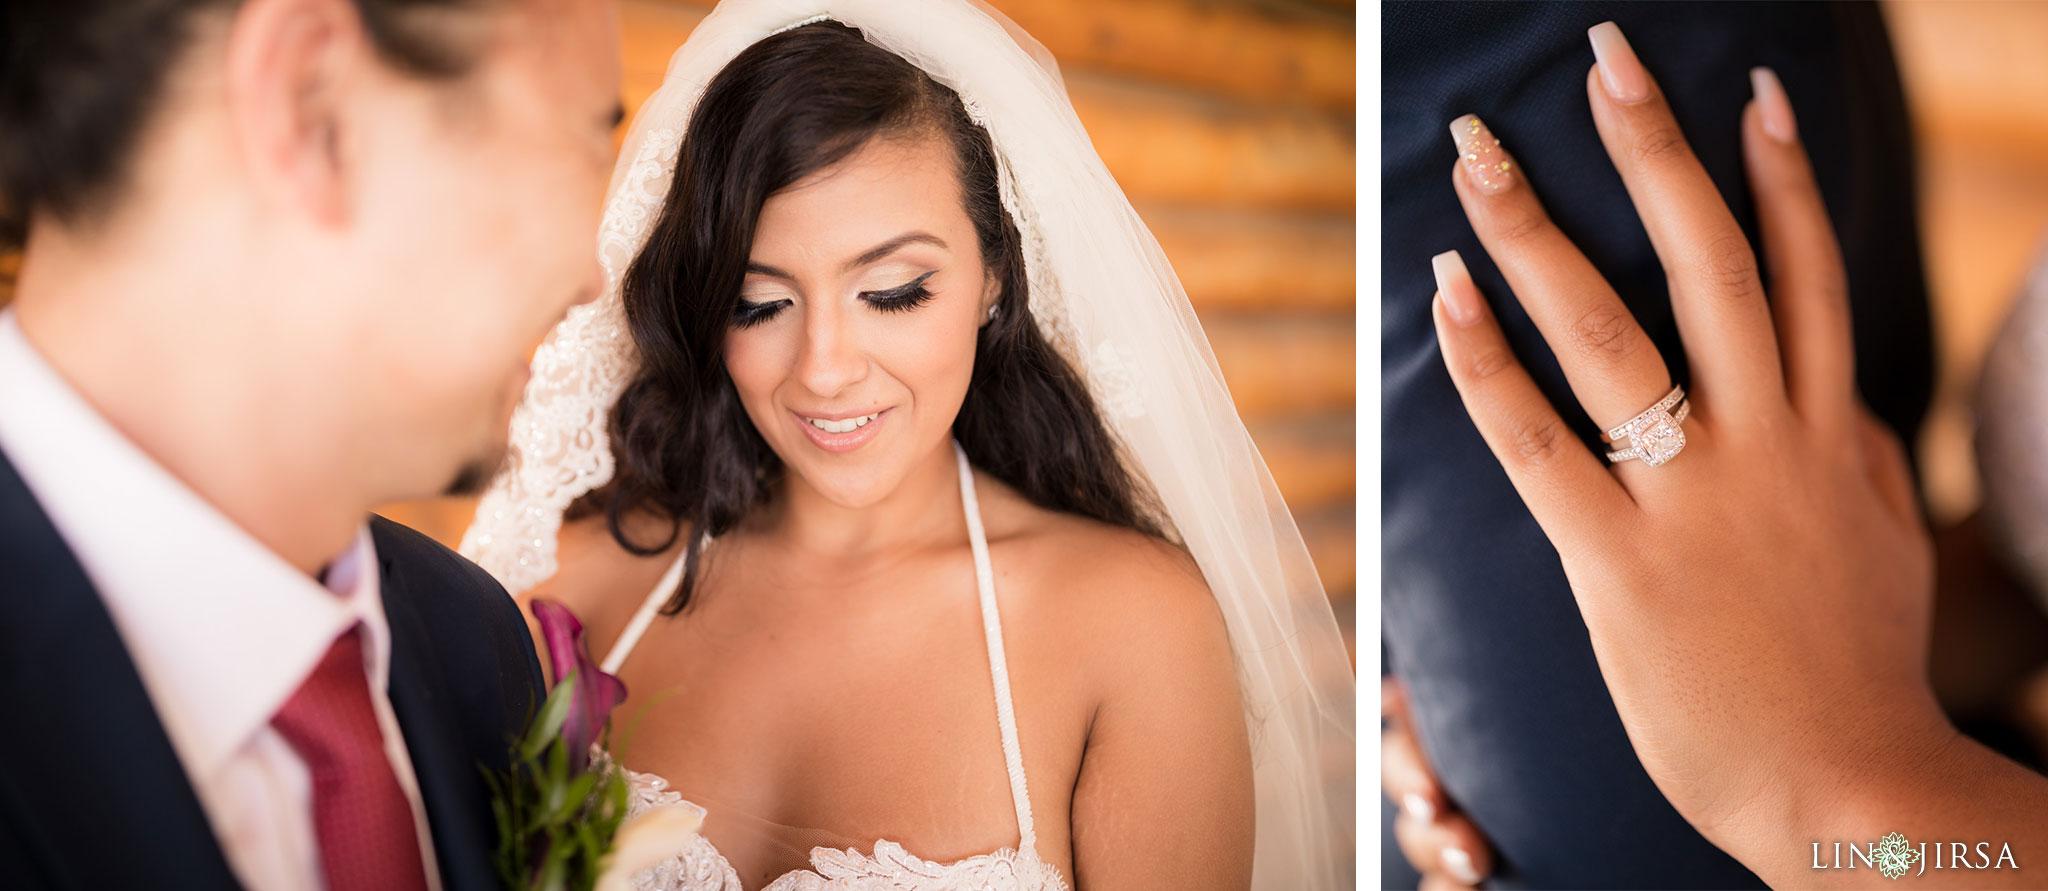 20 orange county wedding bride groom photography